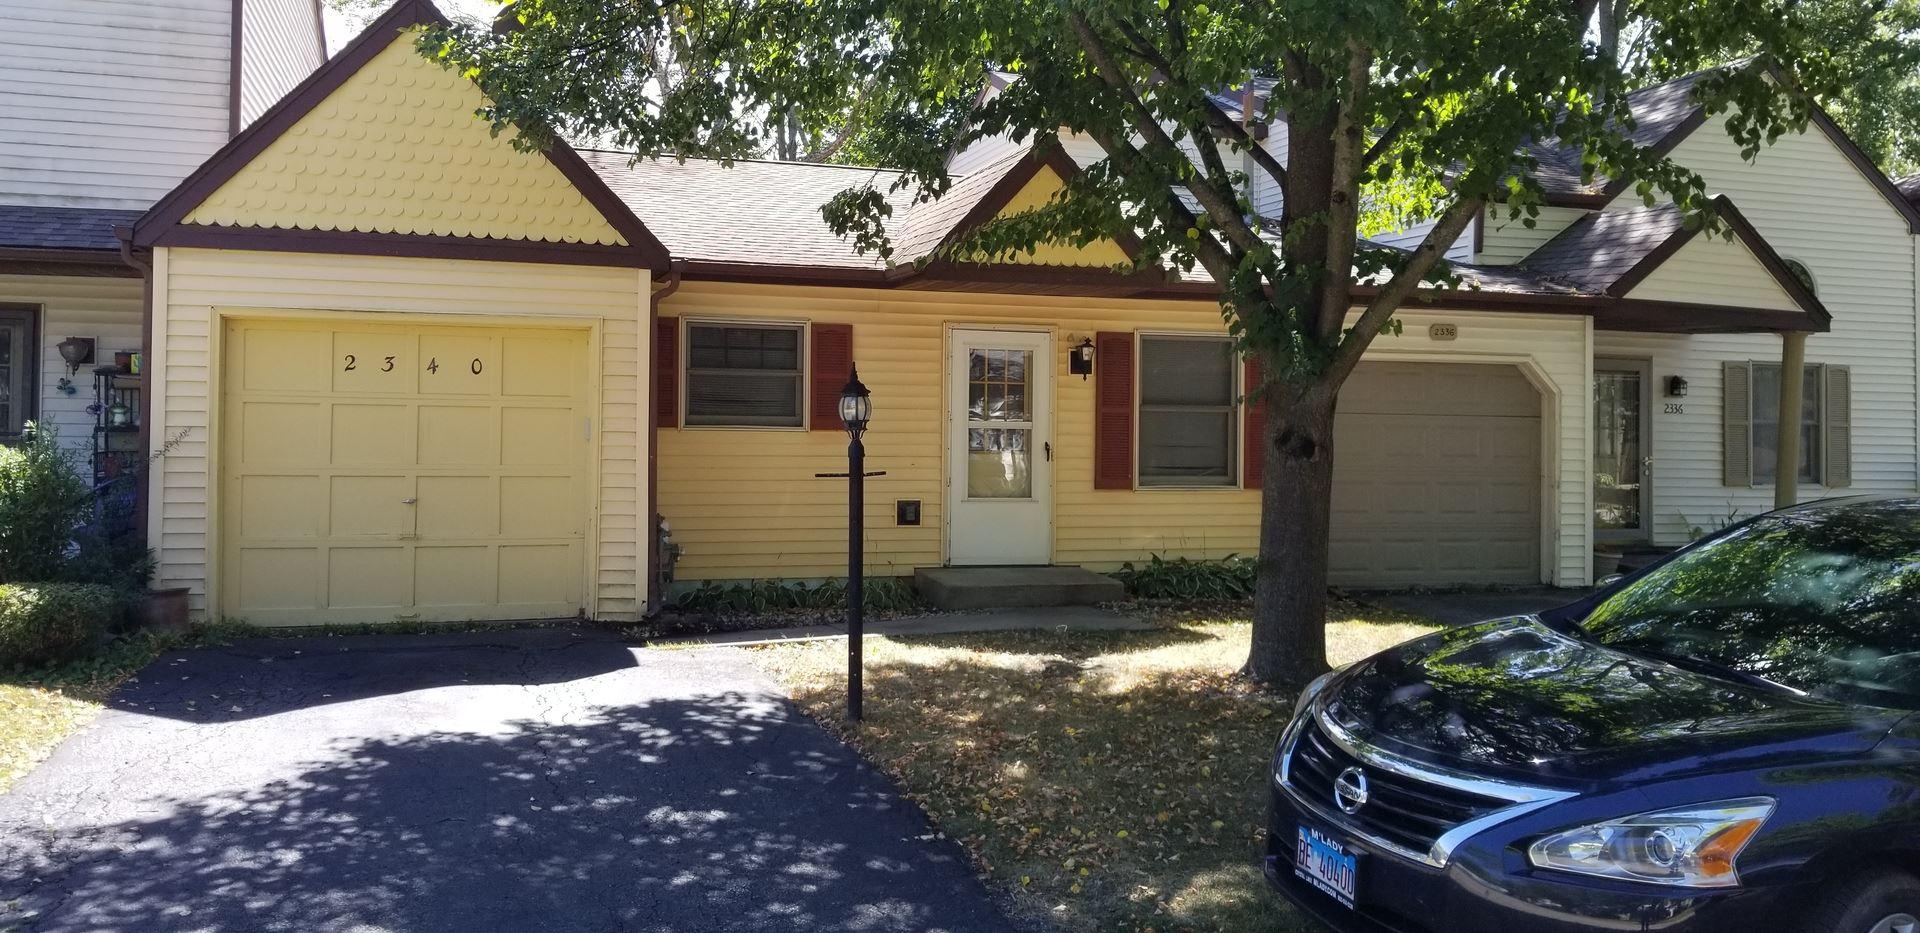 2340 Linden Drive #2340, Woodstock, IL 60098 - #: 10892466